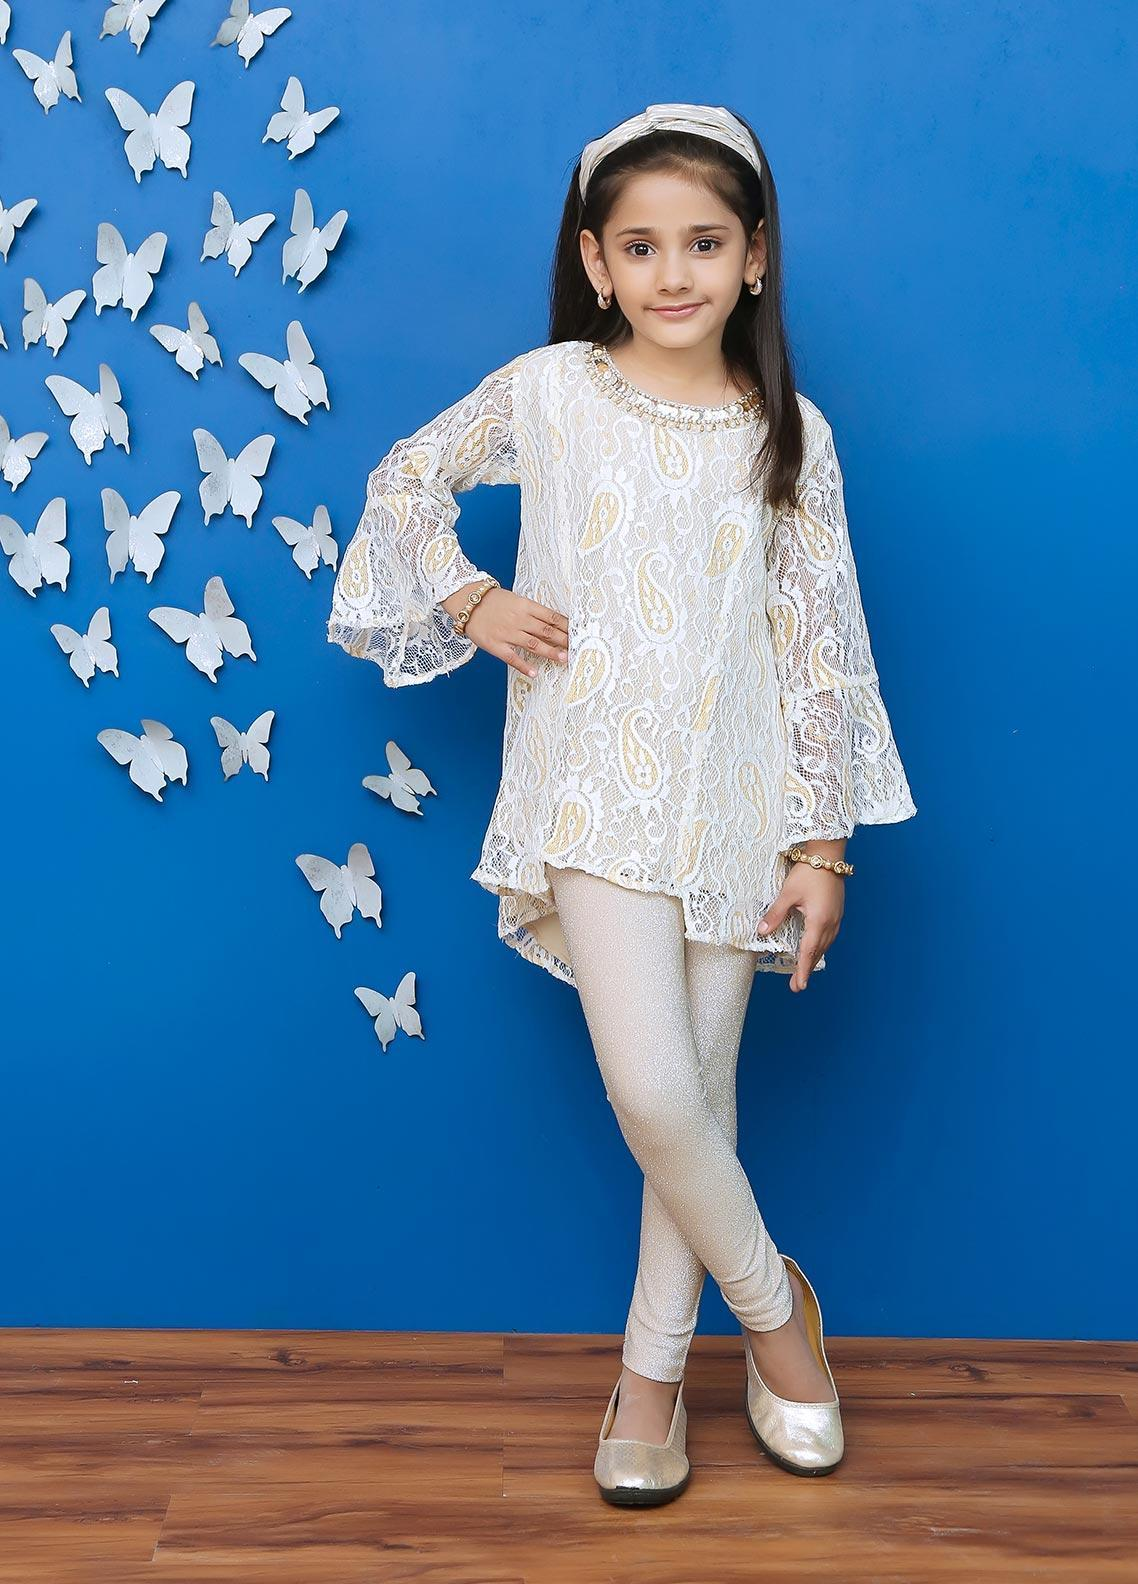 Ochre Cotton Formal Kurti for Girls -  OFK 643 Beige